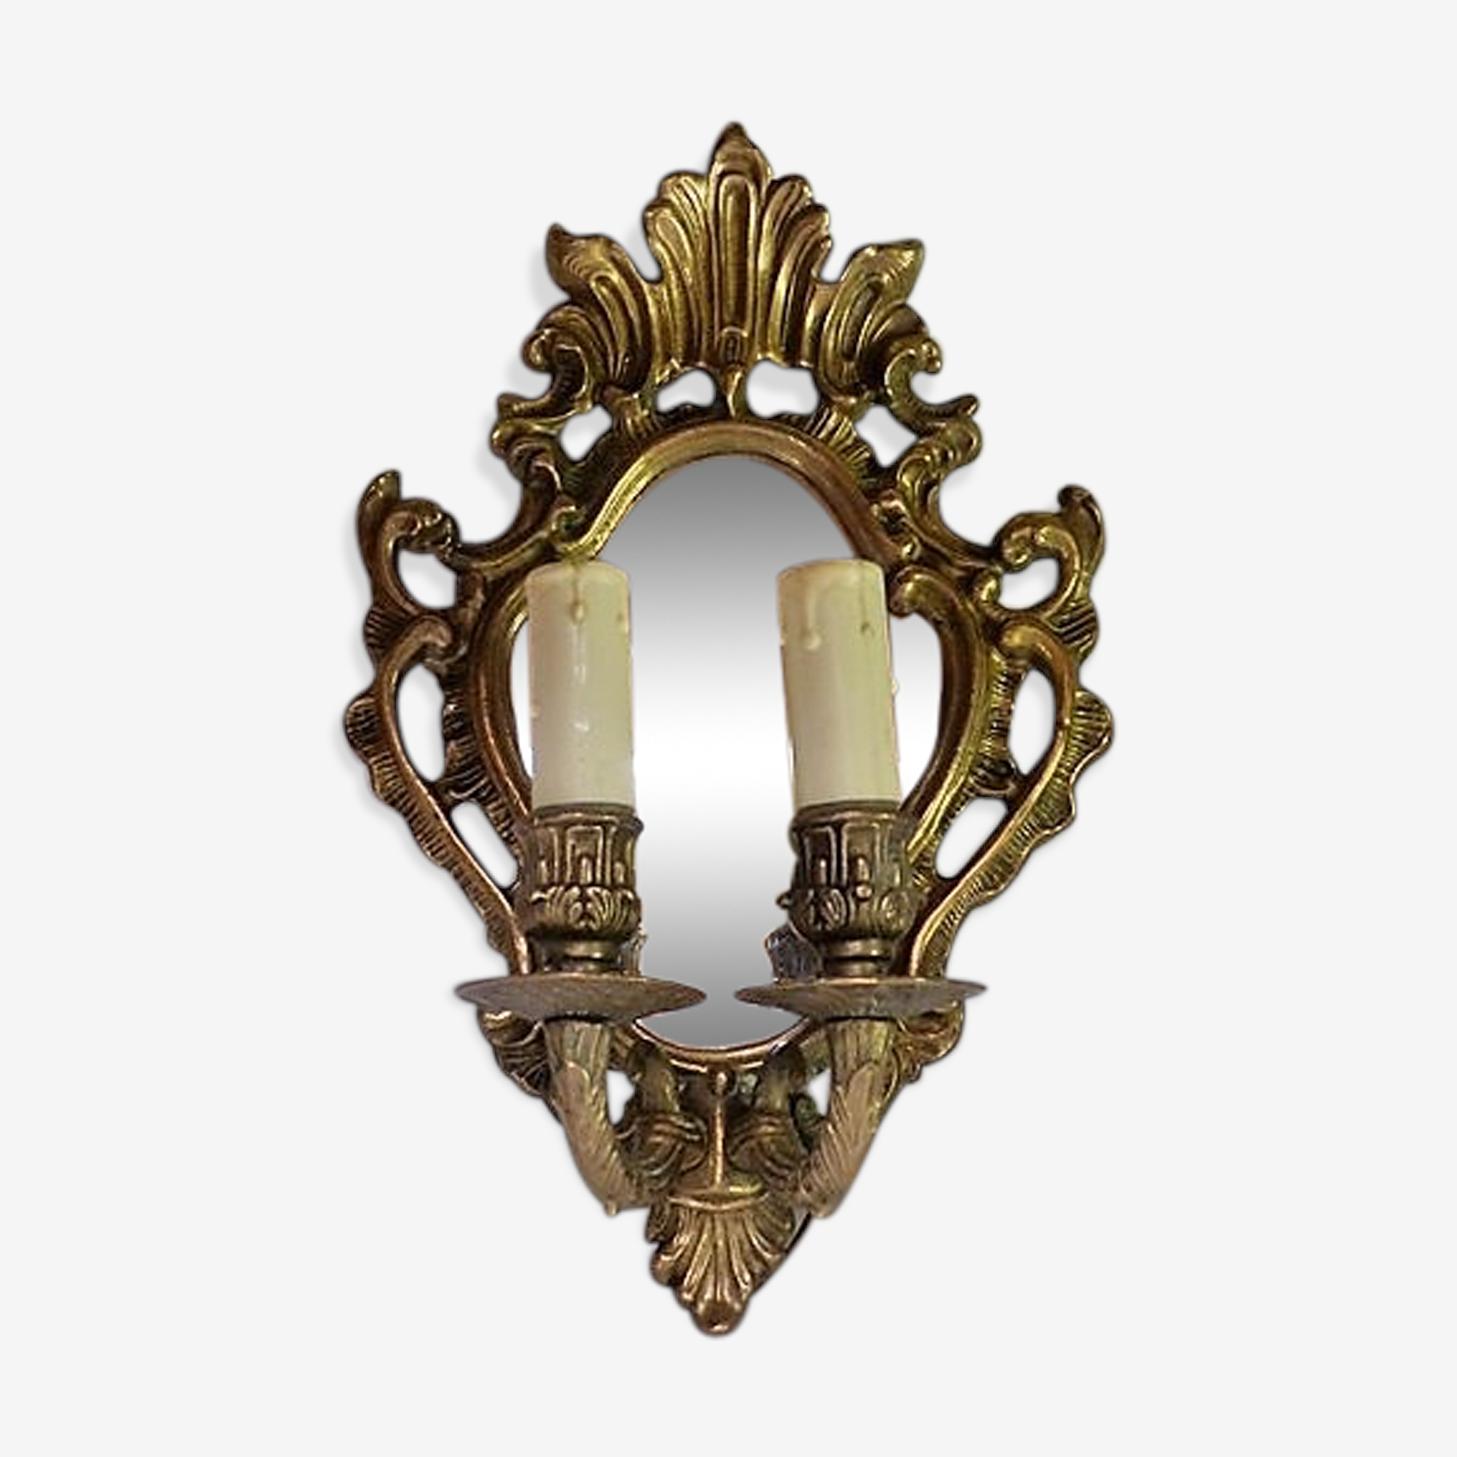 Applique miroir en bronze